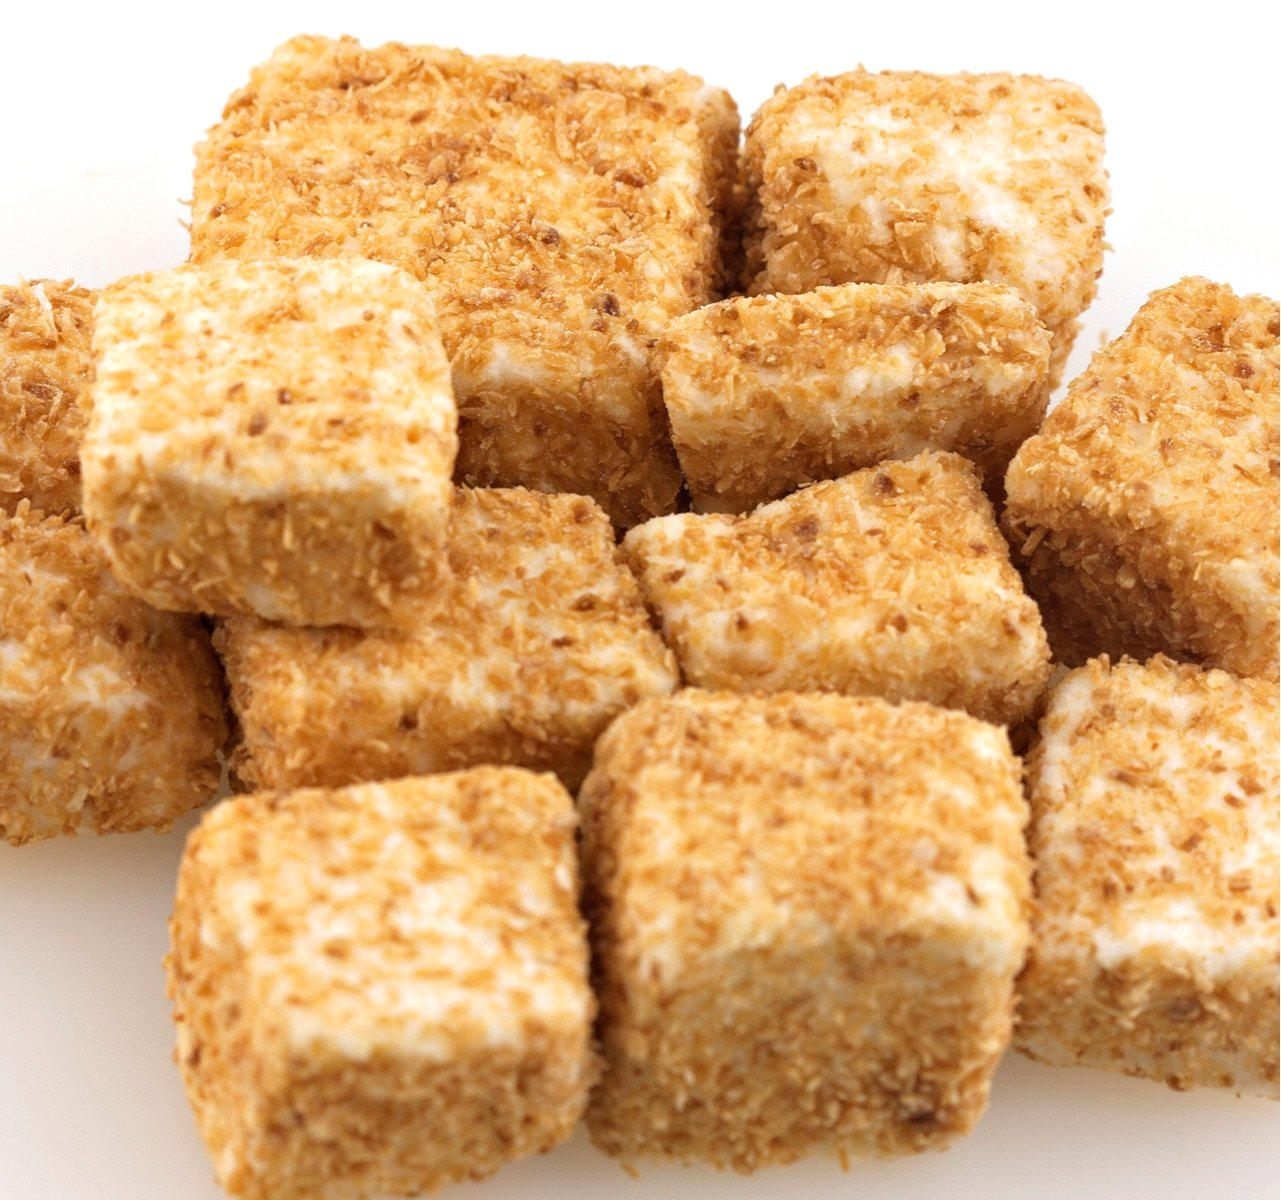 Toasted Coconut Marshmallows - 1 Lb Tub